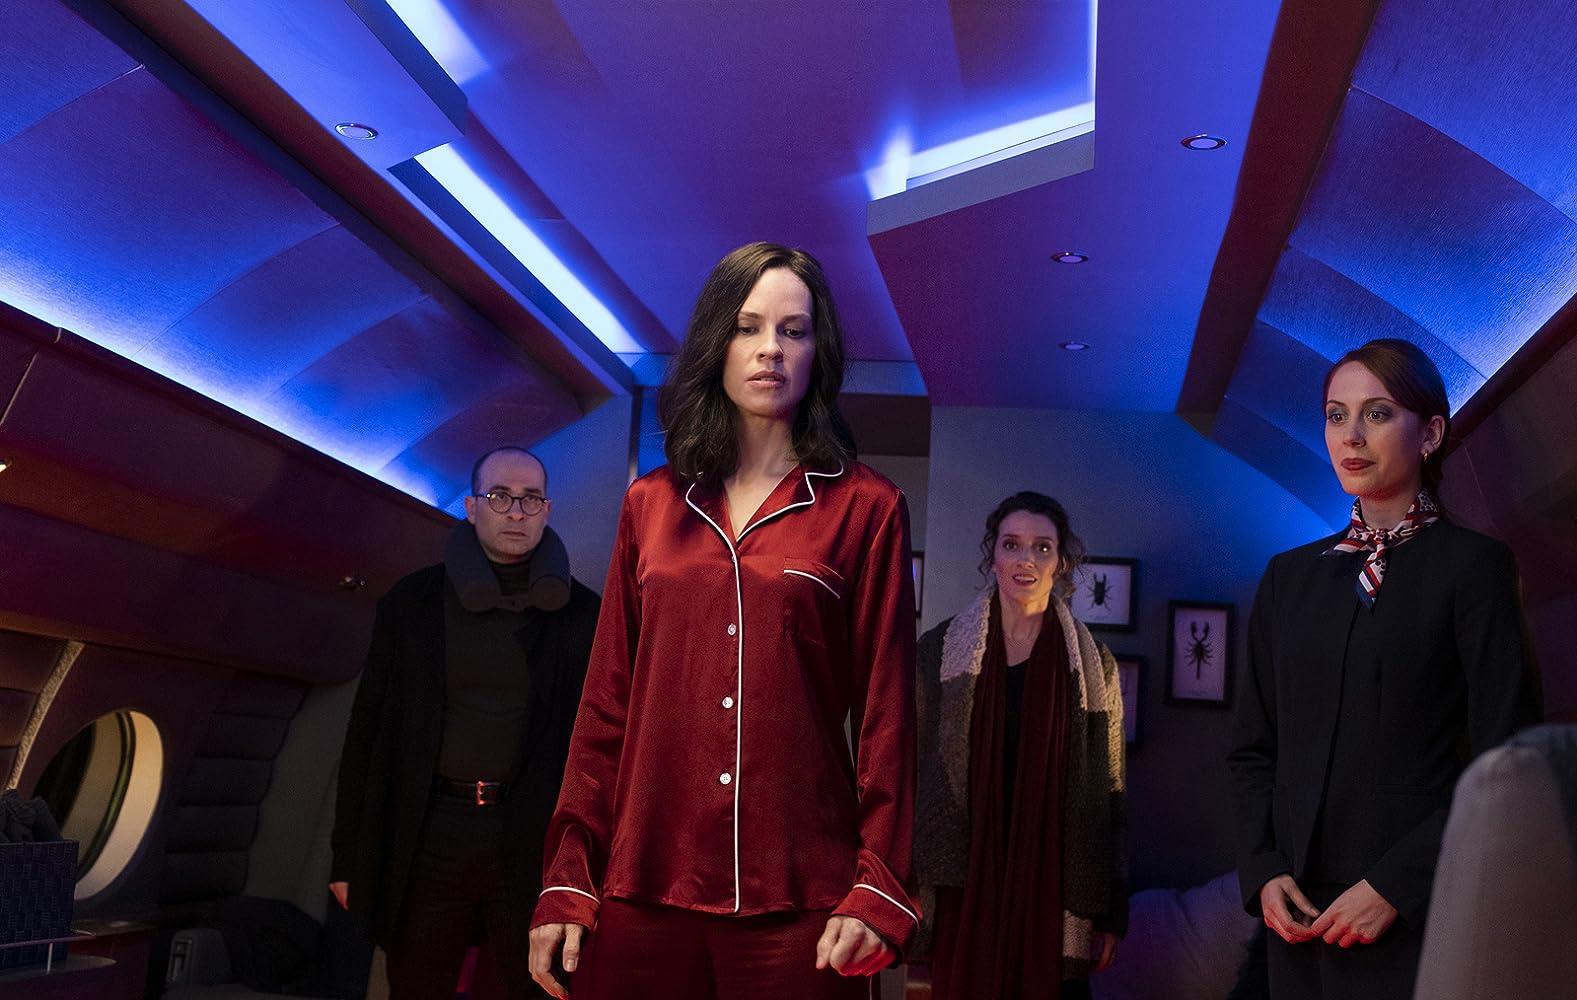 Hilary Swank, Vince Pisani, Teri Wyble, and Hannah Alline in The Hunt (2020)